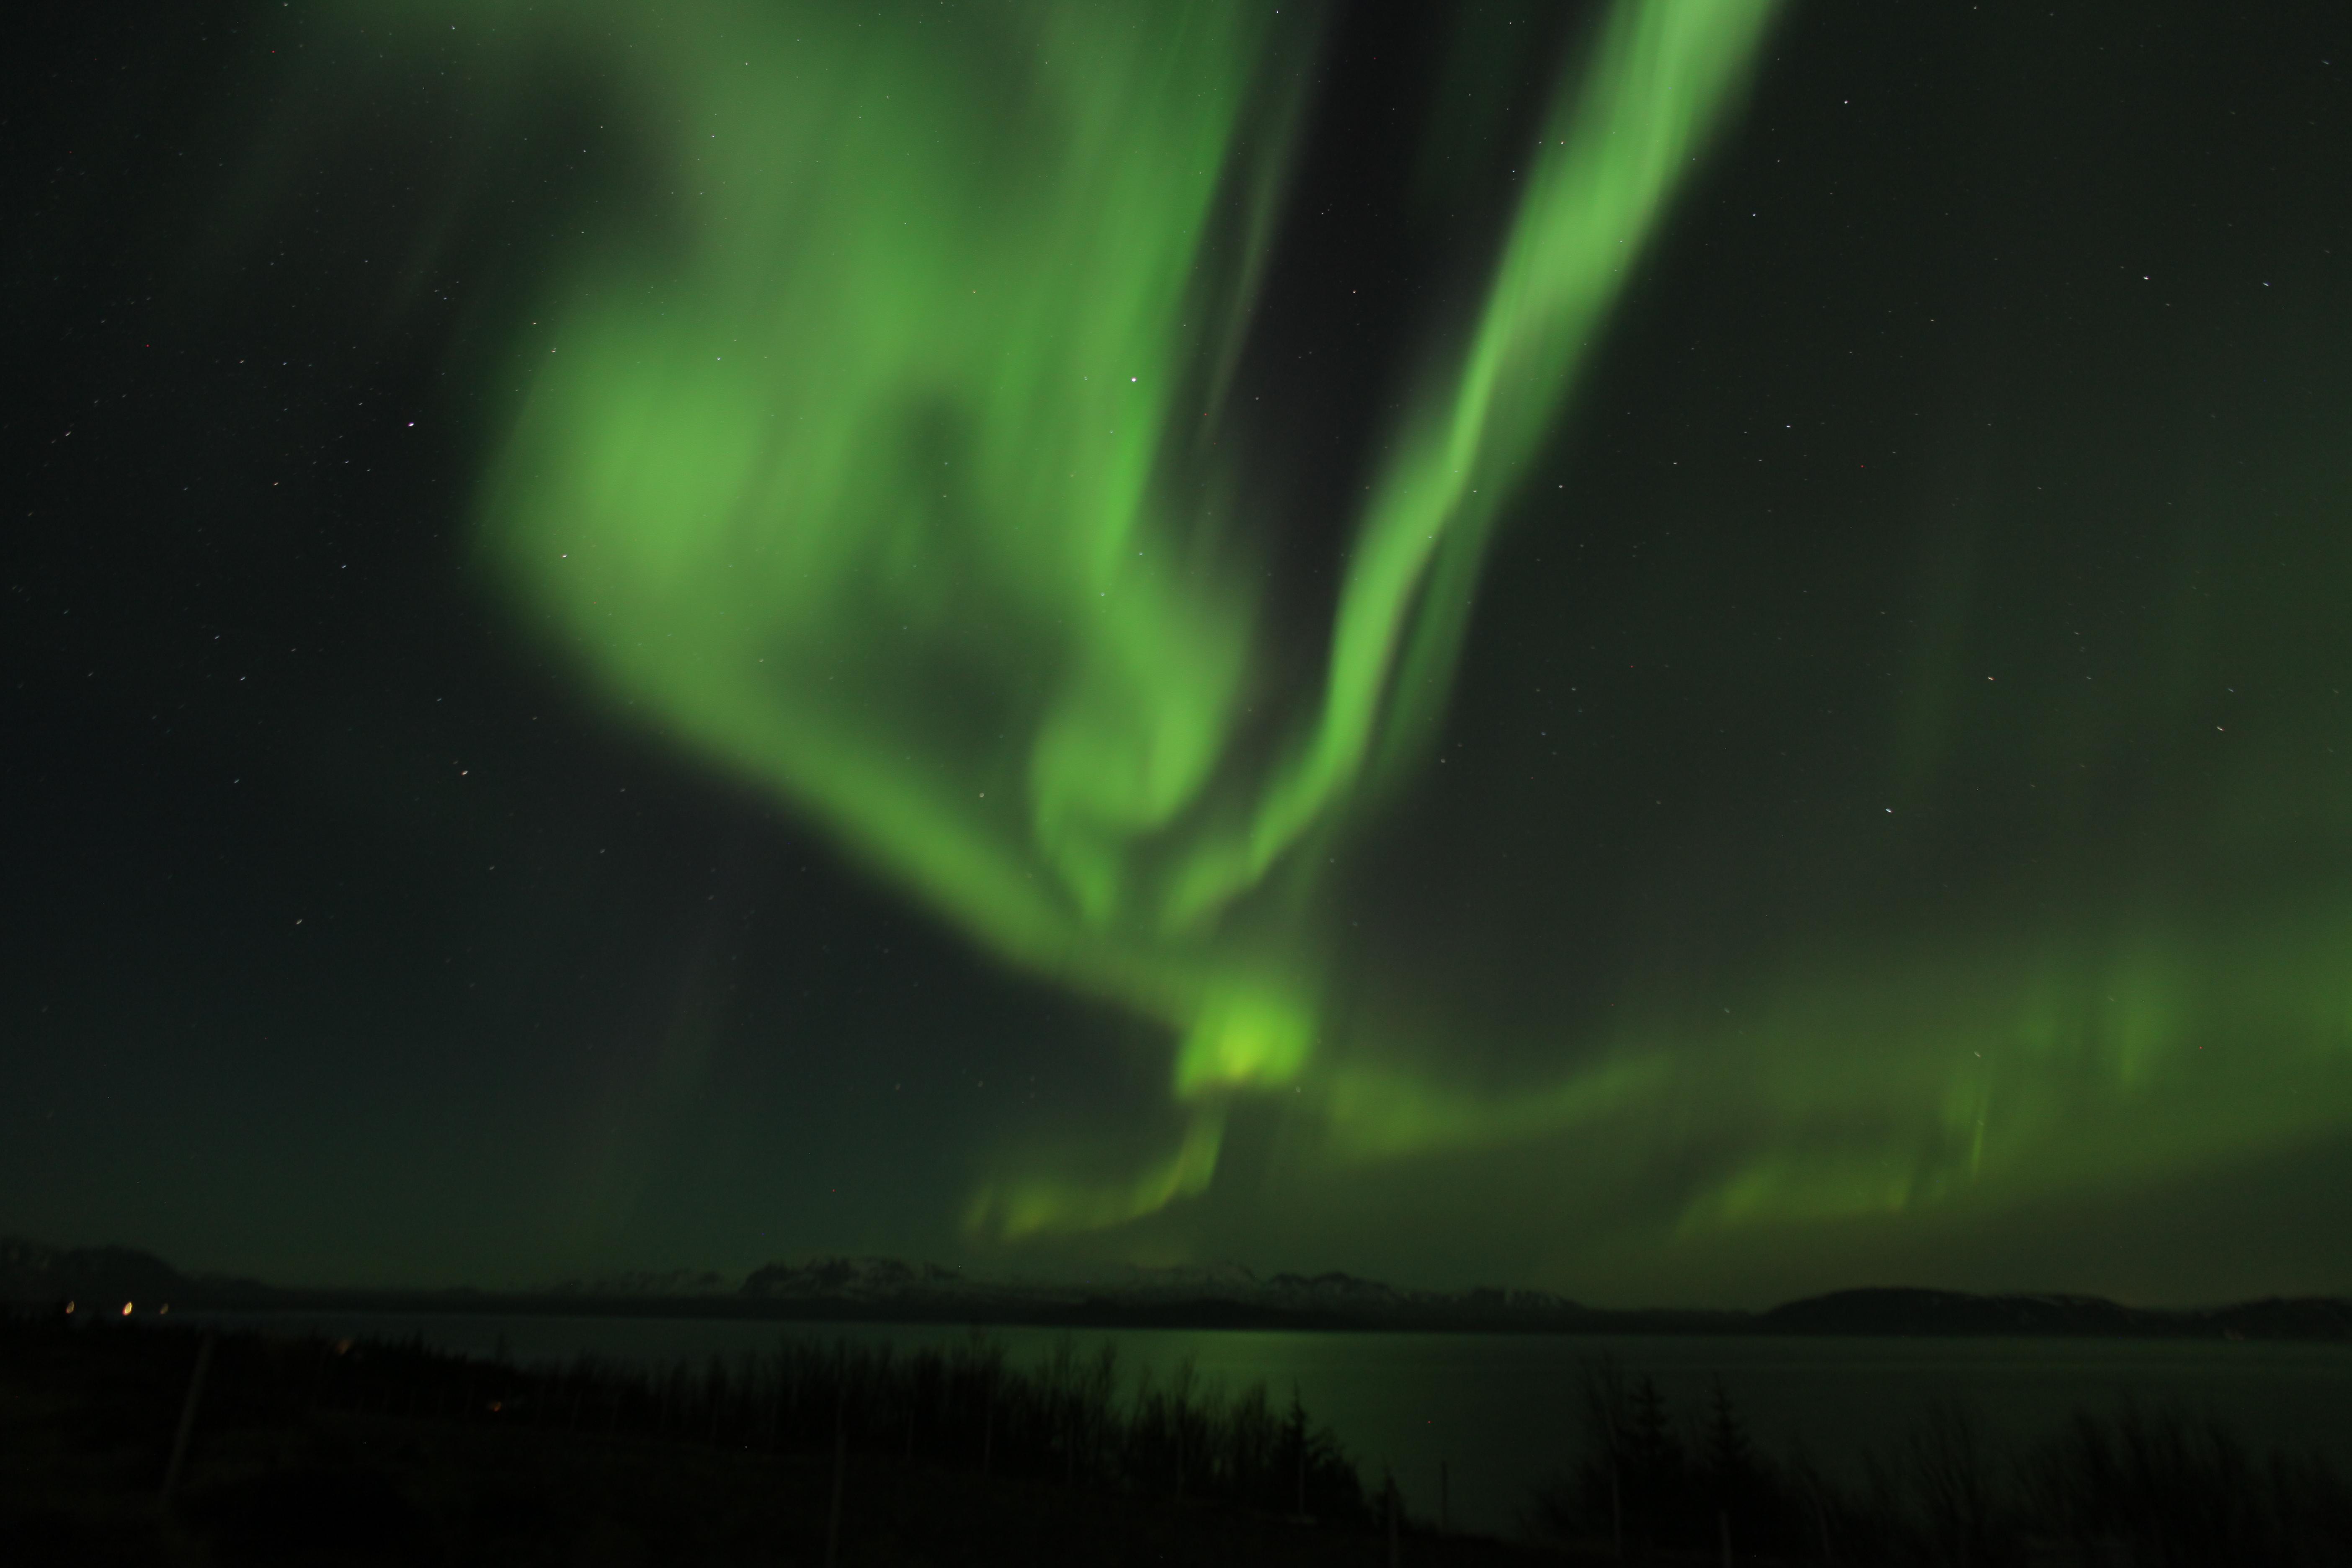 Aurora dancing in the sky, not far from Reykjavík, Iceland.